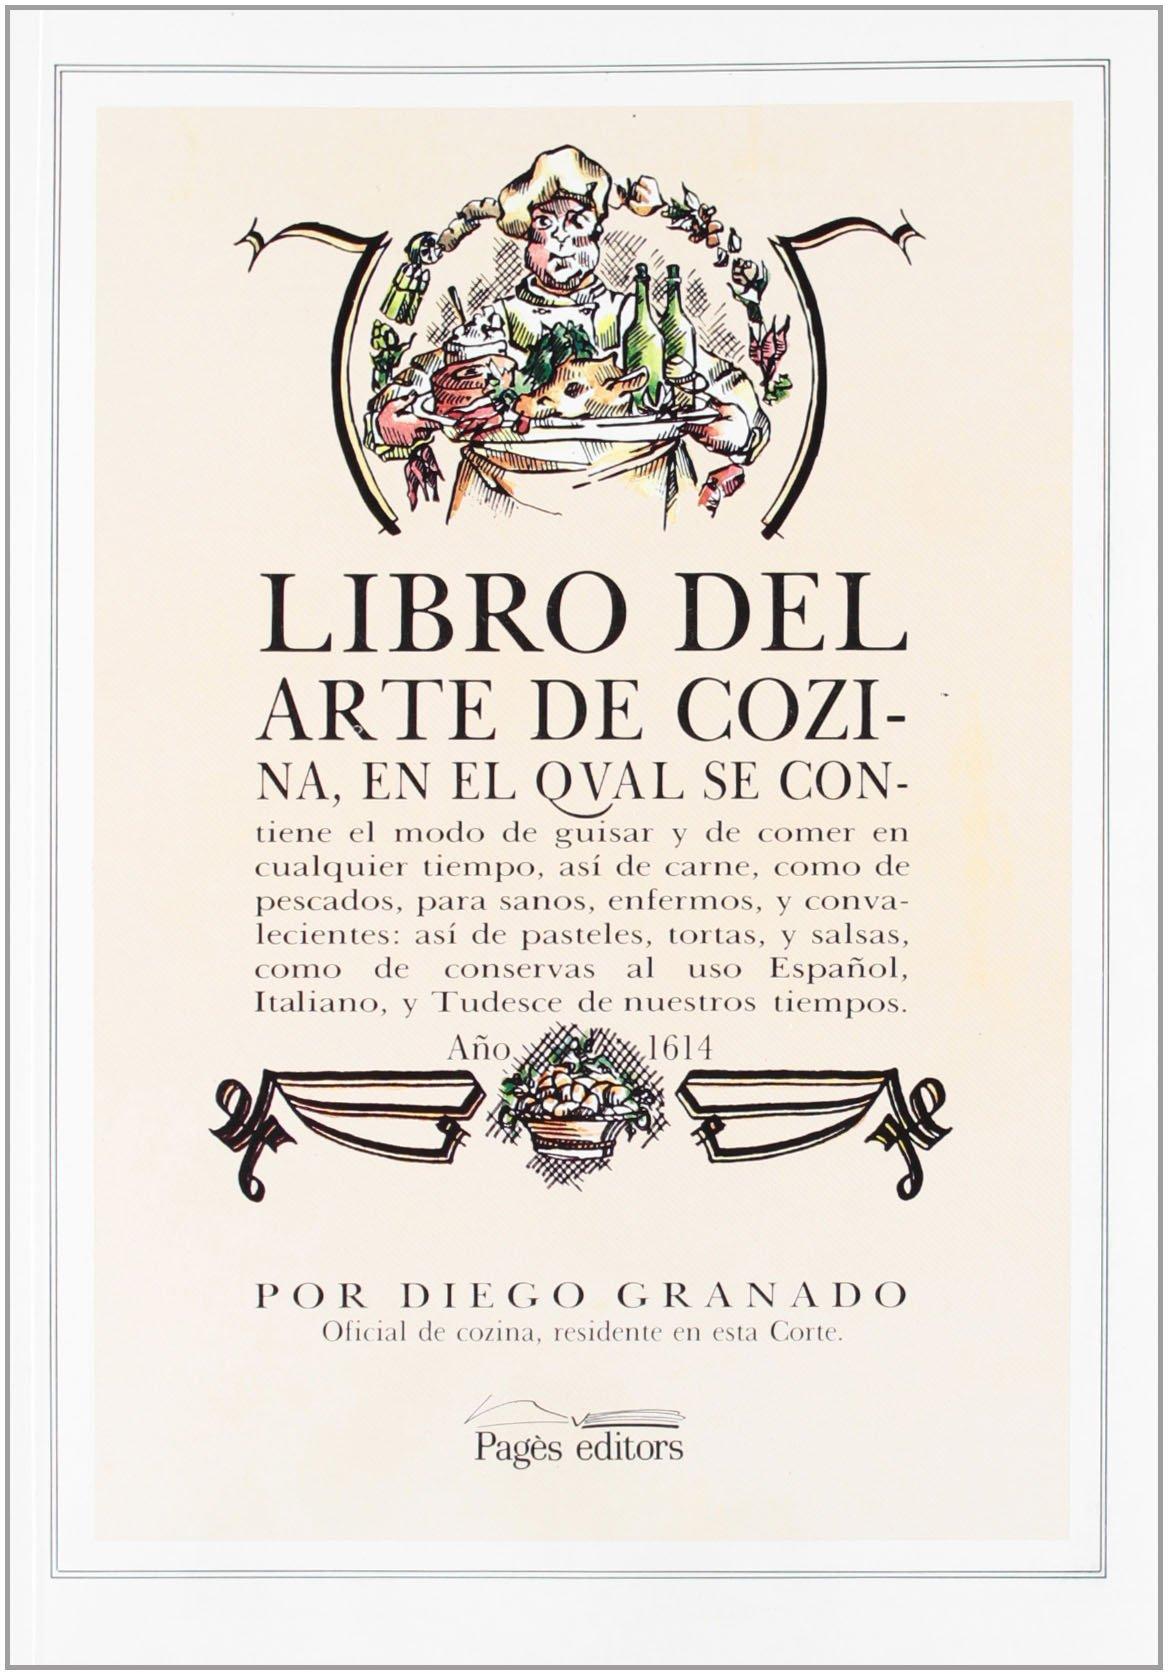 Libro del arte de cozina, año 1614: Diego Granado: 9788479350154: Amazon.com: Books